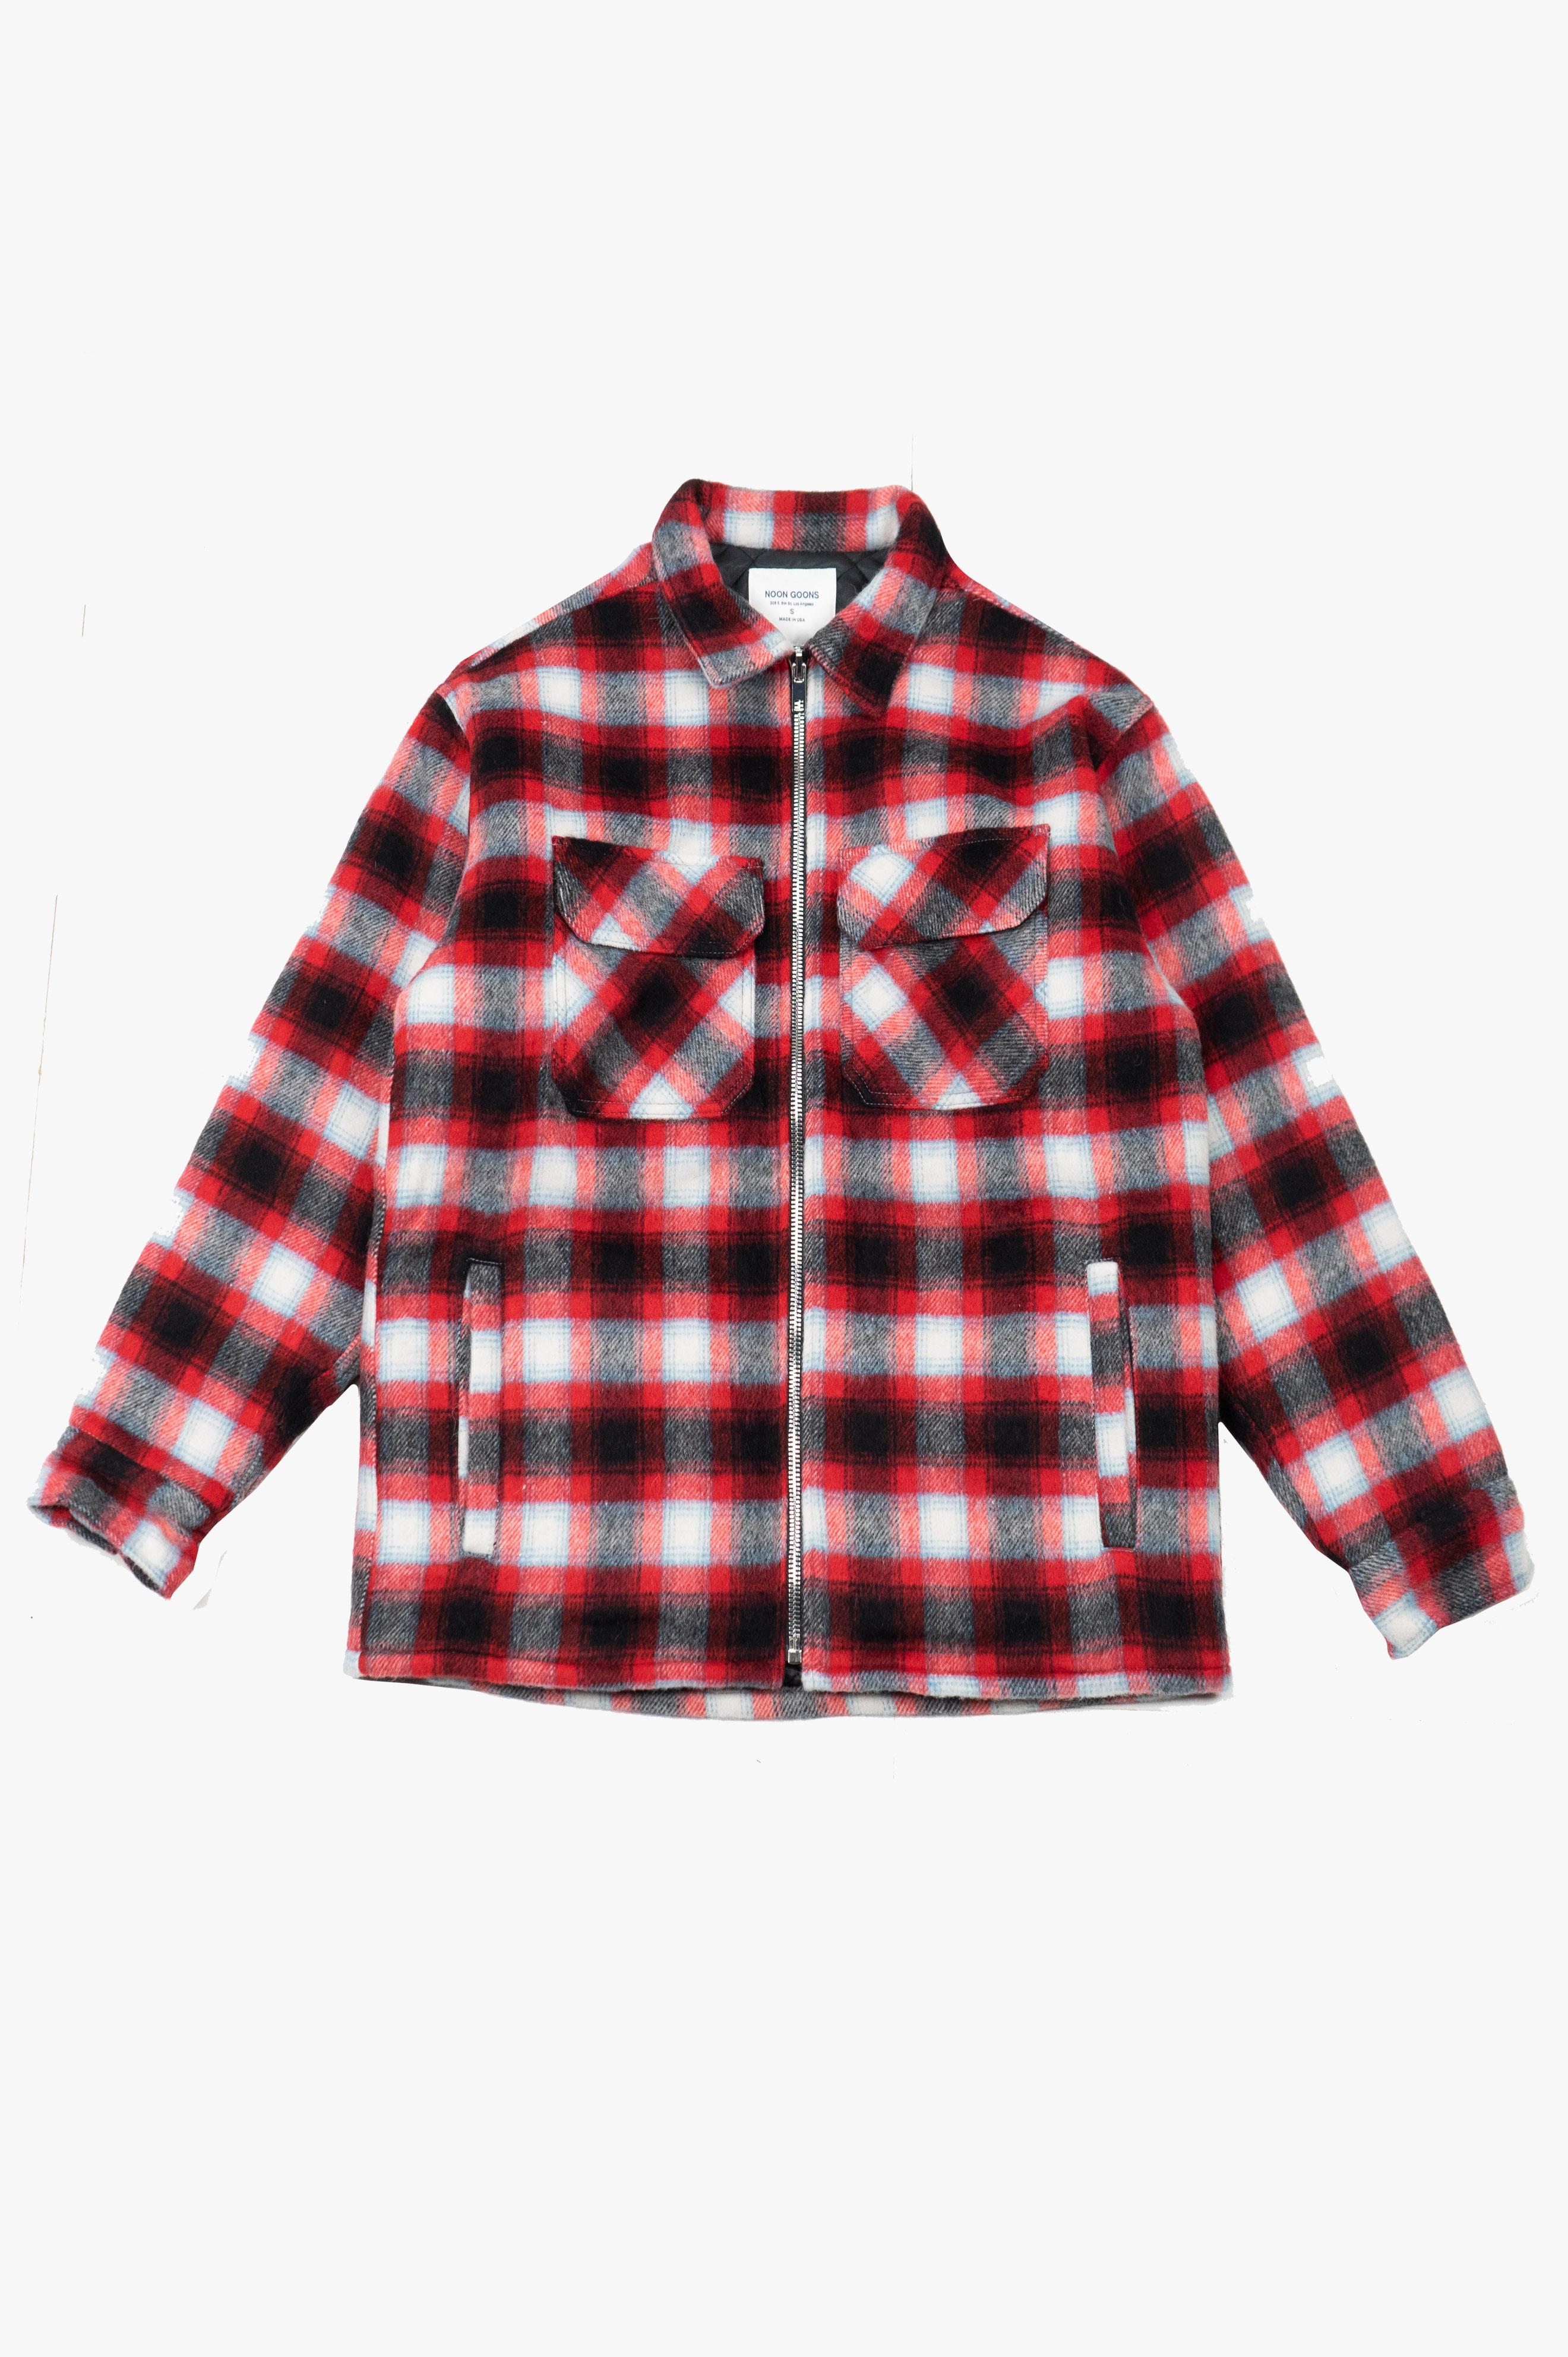 Best Coast Jacket Red